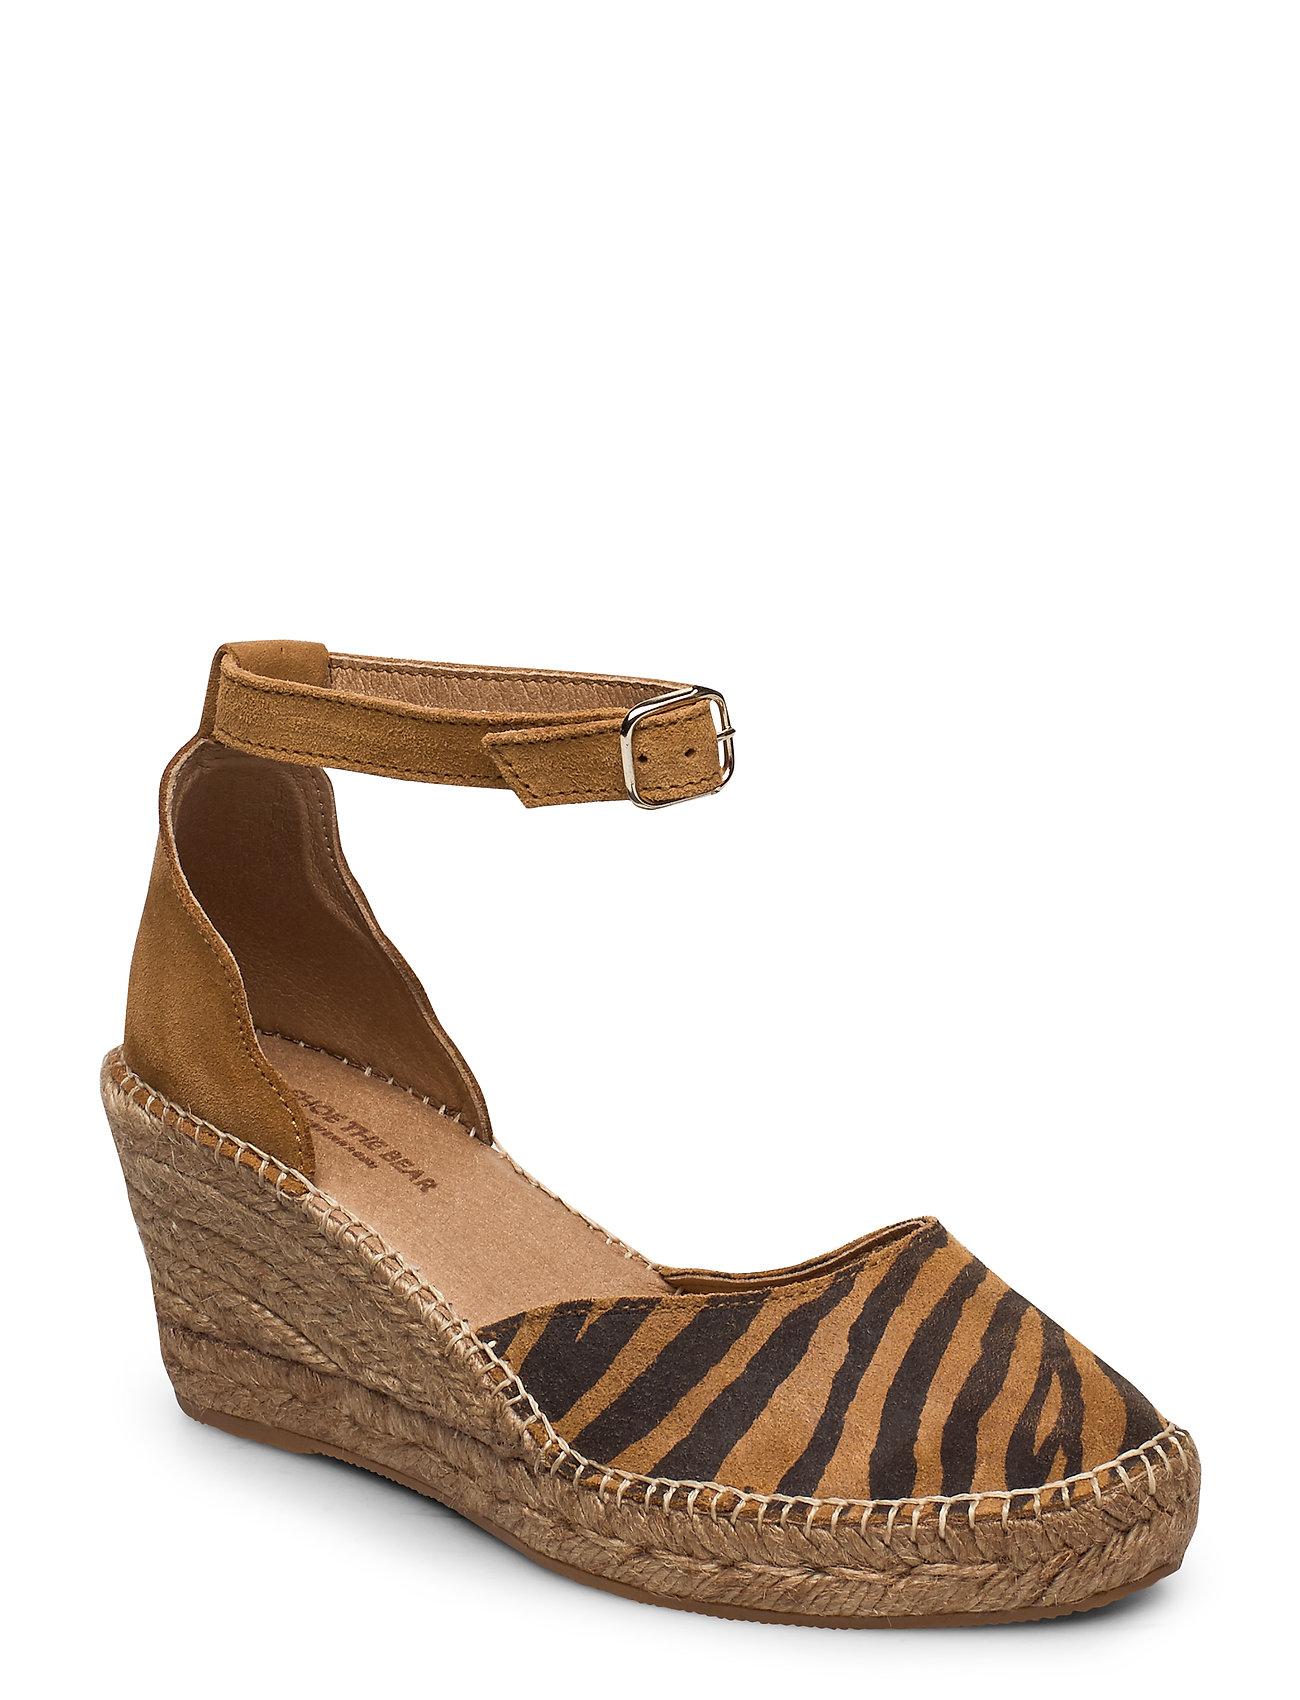 Image of Stb-Salome Ankle Strap Espadrillos Med Hæl Sandal Brun Shoe The Bear (3370074749)